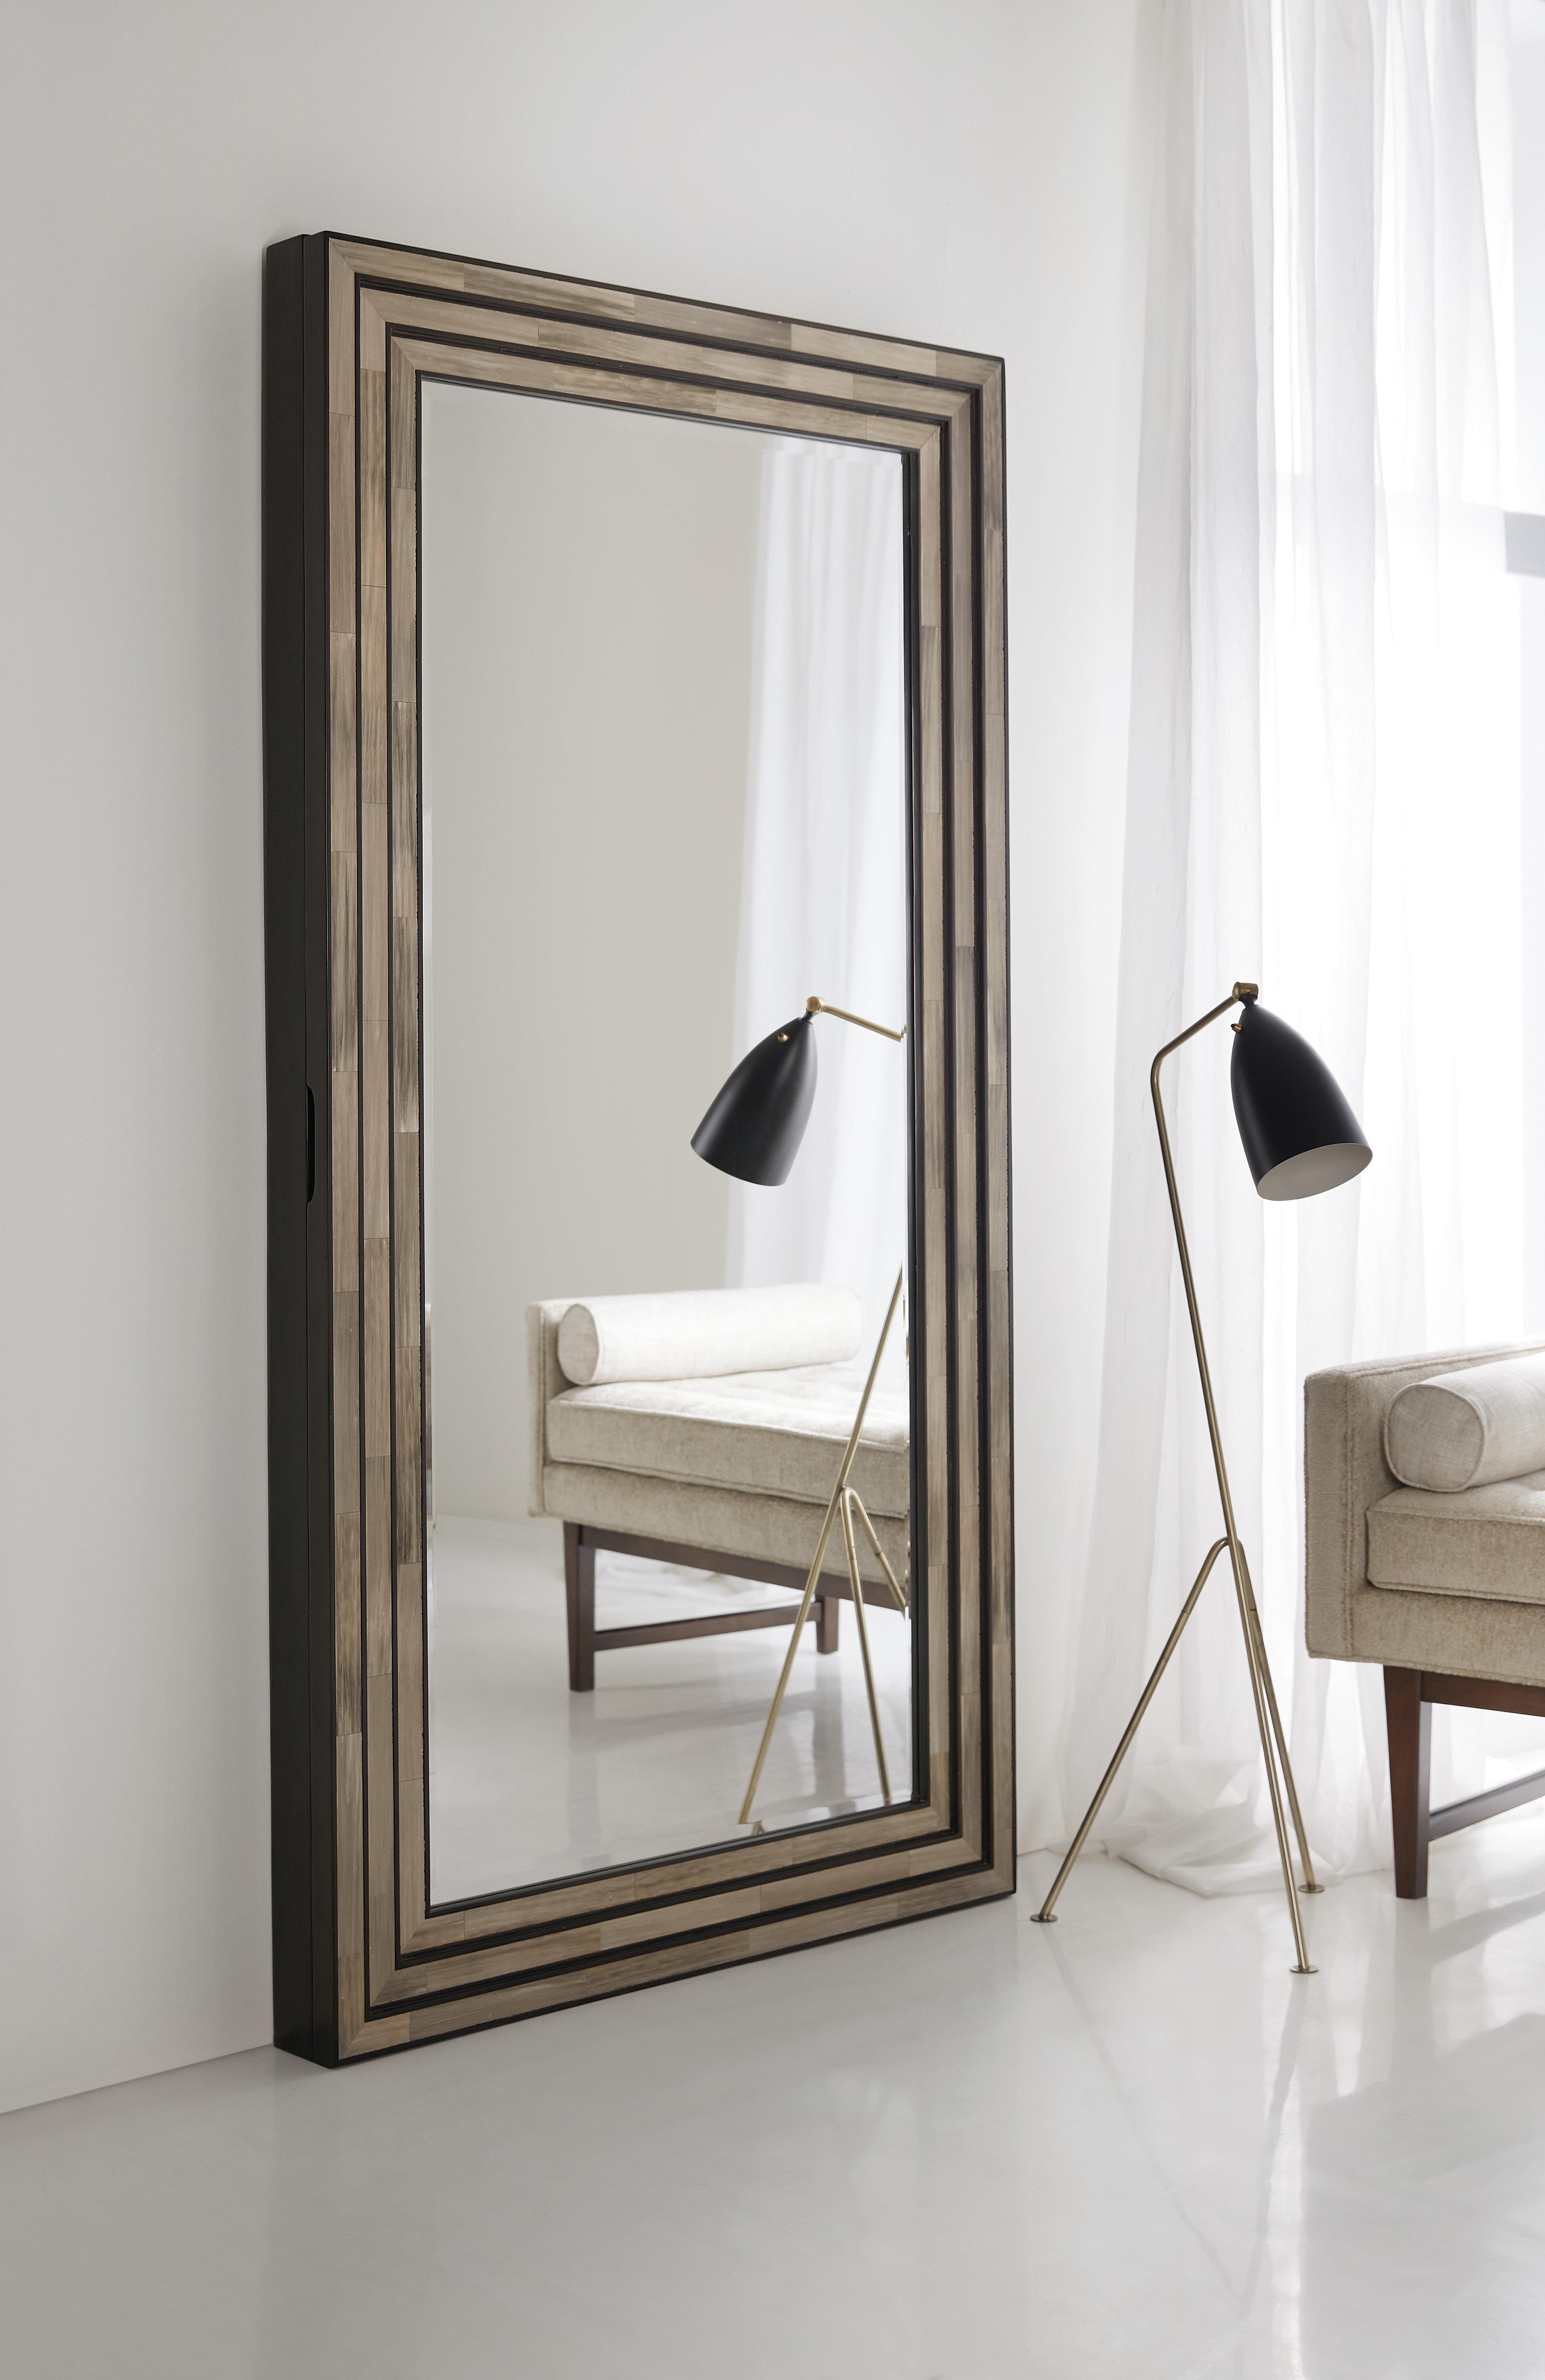 Hooker Furniture Melange Venice Wall Mount Jewelry Armoire With Mirror Wayfair